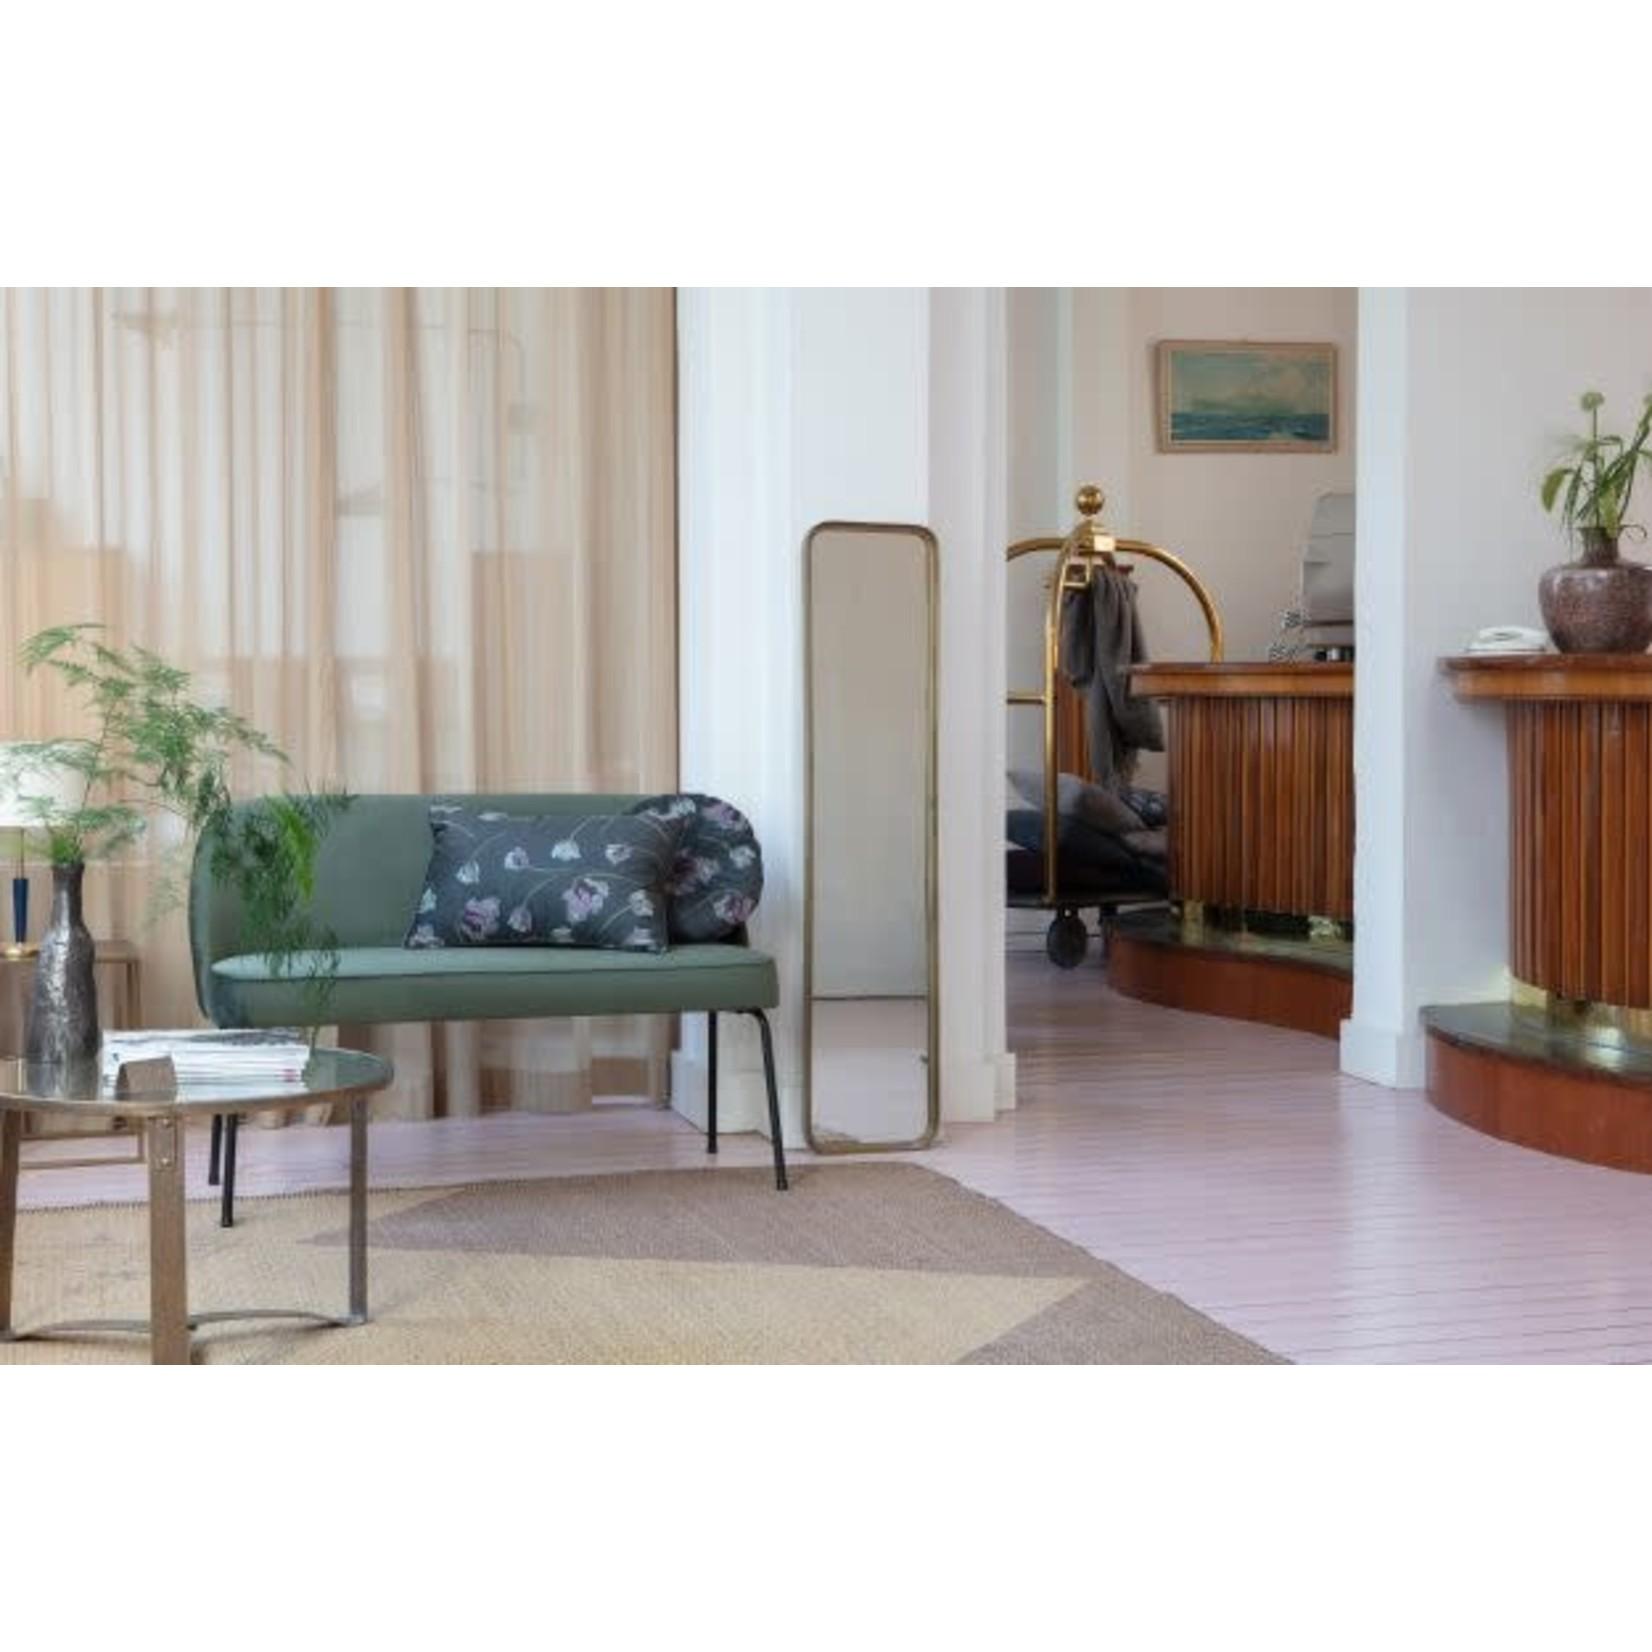 Be Pure Home Vogue Eetbank Fluweel Onyx